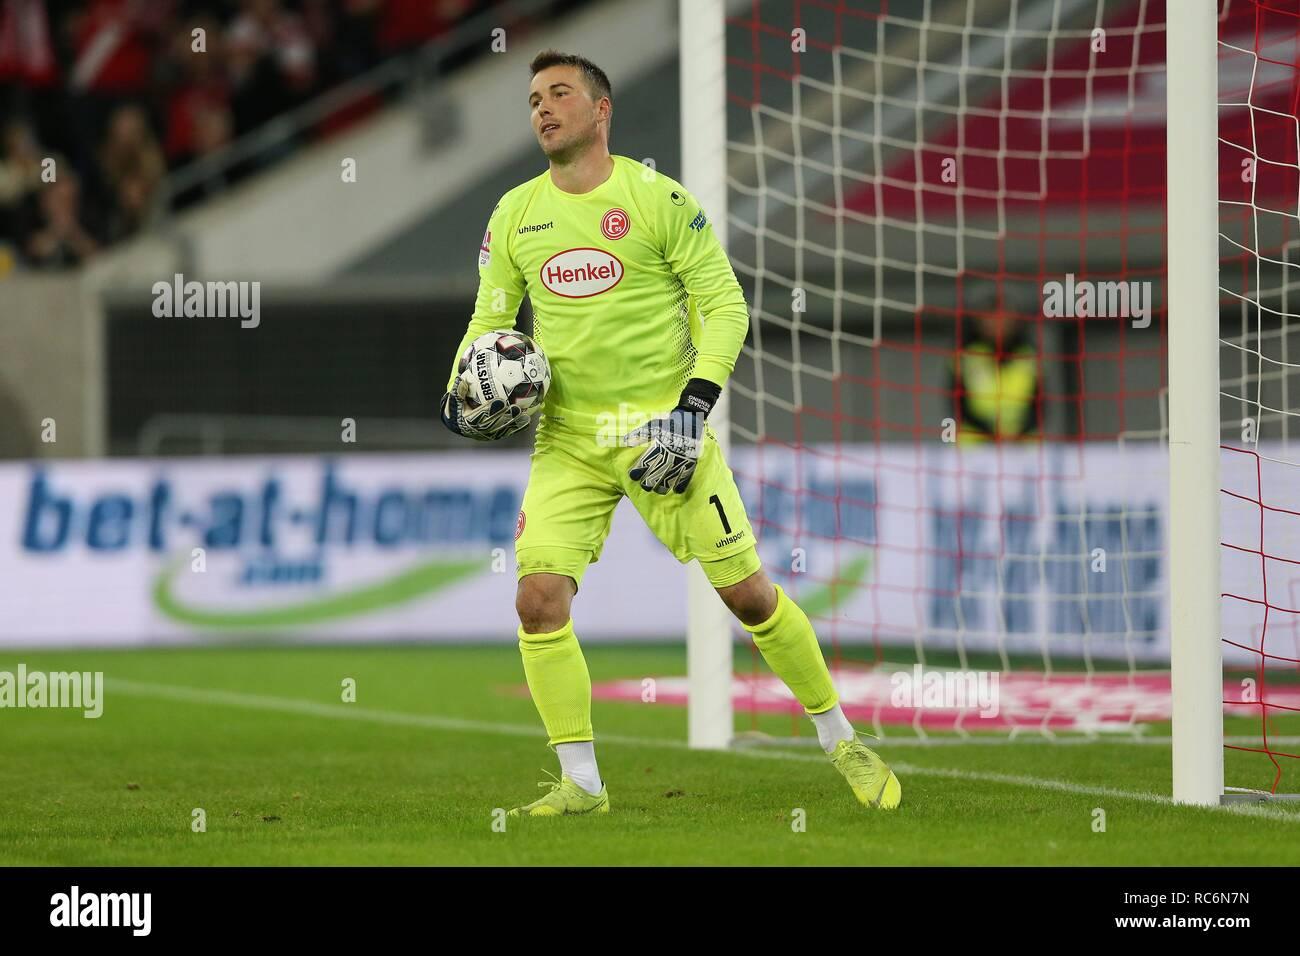 firo: 13.01.2019, football, 1.Bundesliga, season 2018/2019, Telekom-Cup 2019, Fortuna Dusseldorf, goalkeeper Michael RENSING, single action   usage worldwide - Stock Image